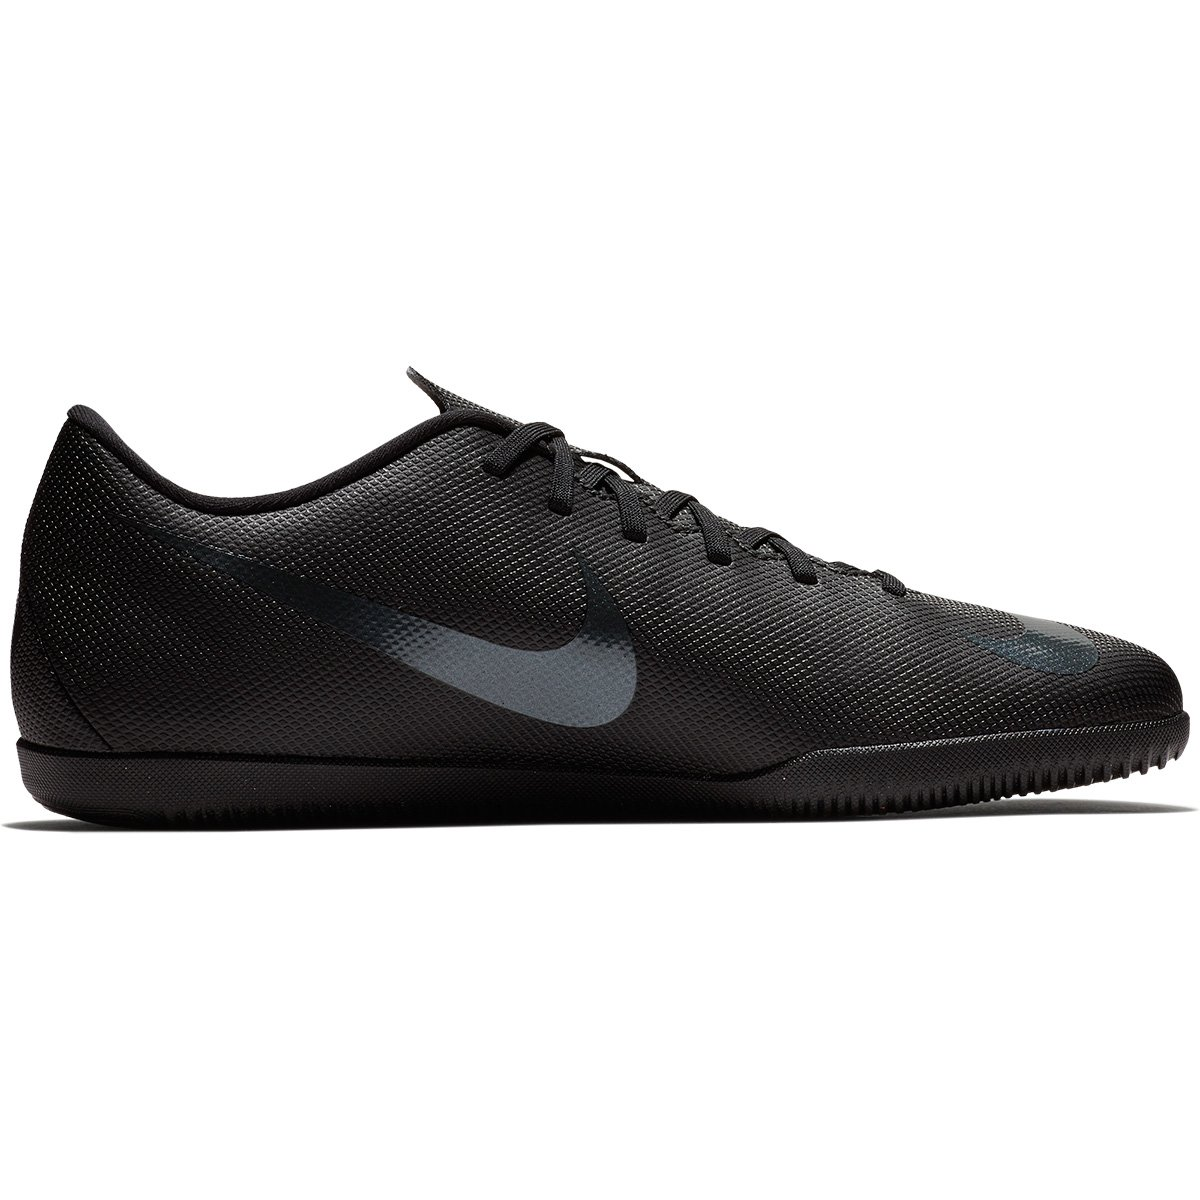 2d8e985644 Chuteira Futsal Nike Mercurial Vapor 12 Club - Preto